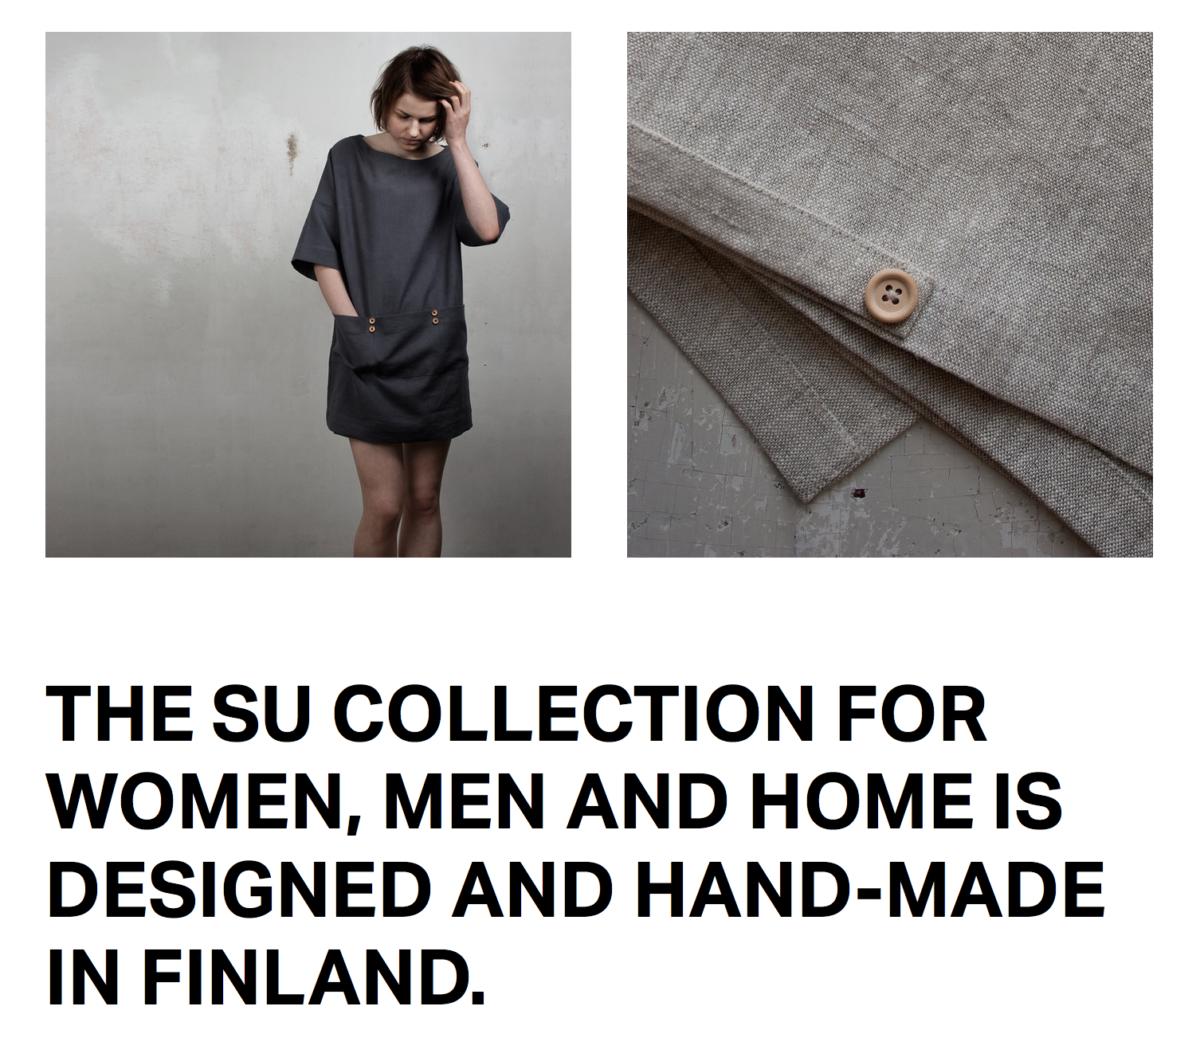 Sunnuntaipuoti   Susan Vatanen   Spezial über finnische Modelabels   Foto: Sunnuntaipuoti   GROSS∆RTIG